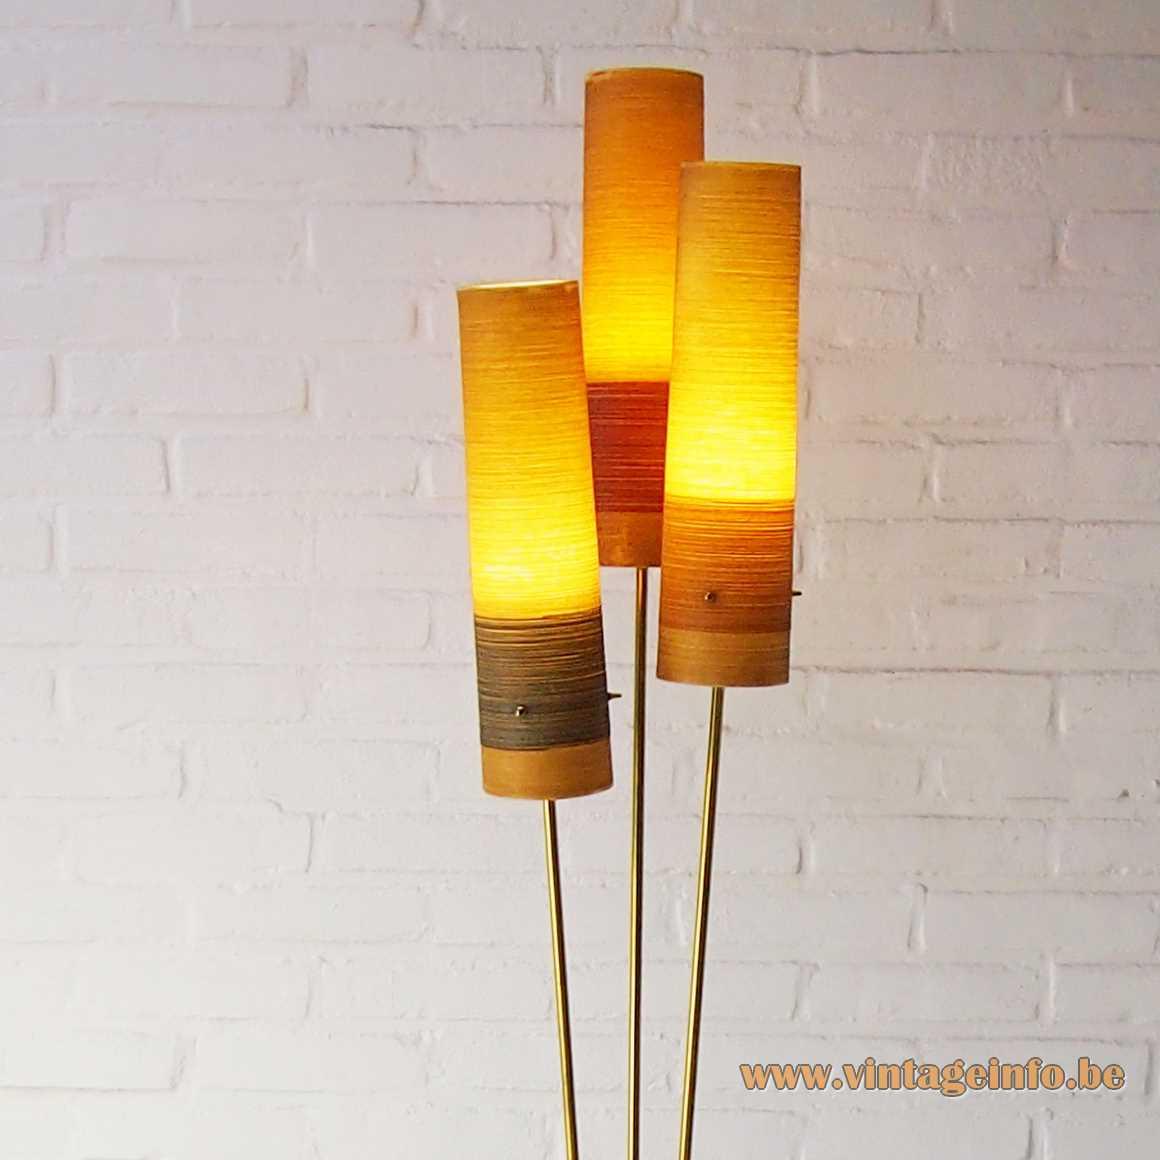 Fibreglass triple cone rocket floor lamp brass rods Novoplast Czech Republic 1950s 1960s Mid-Century Modern